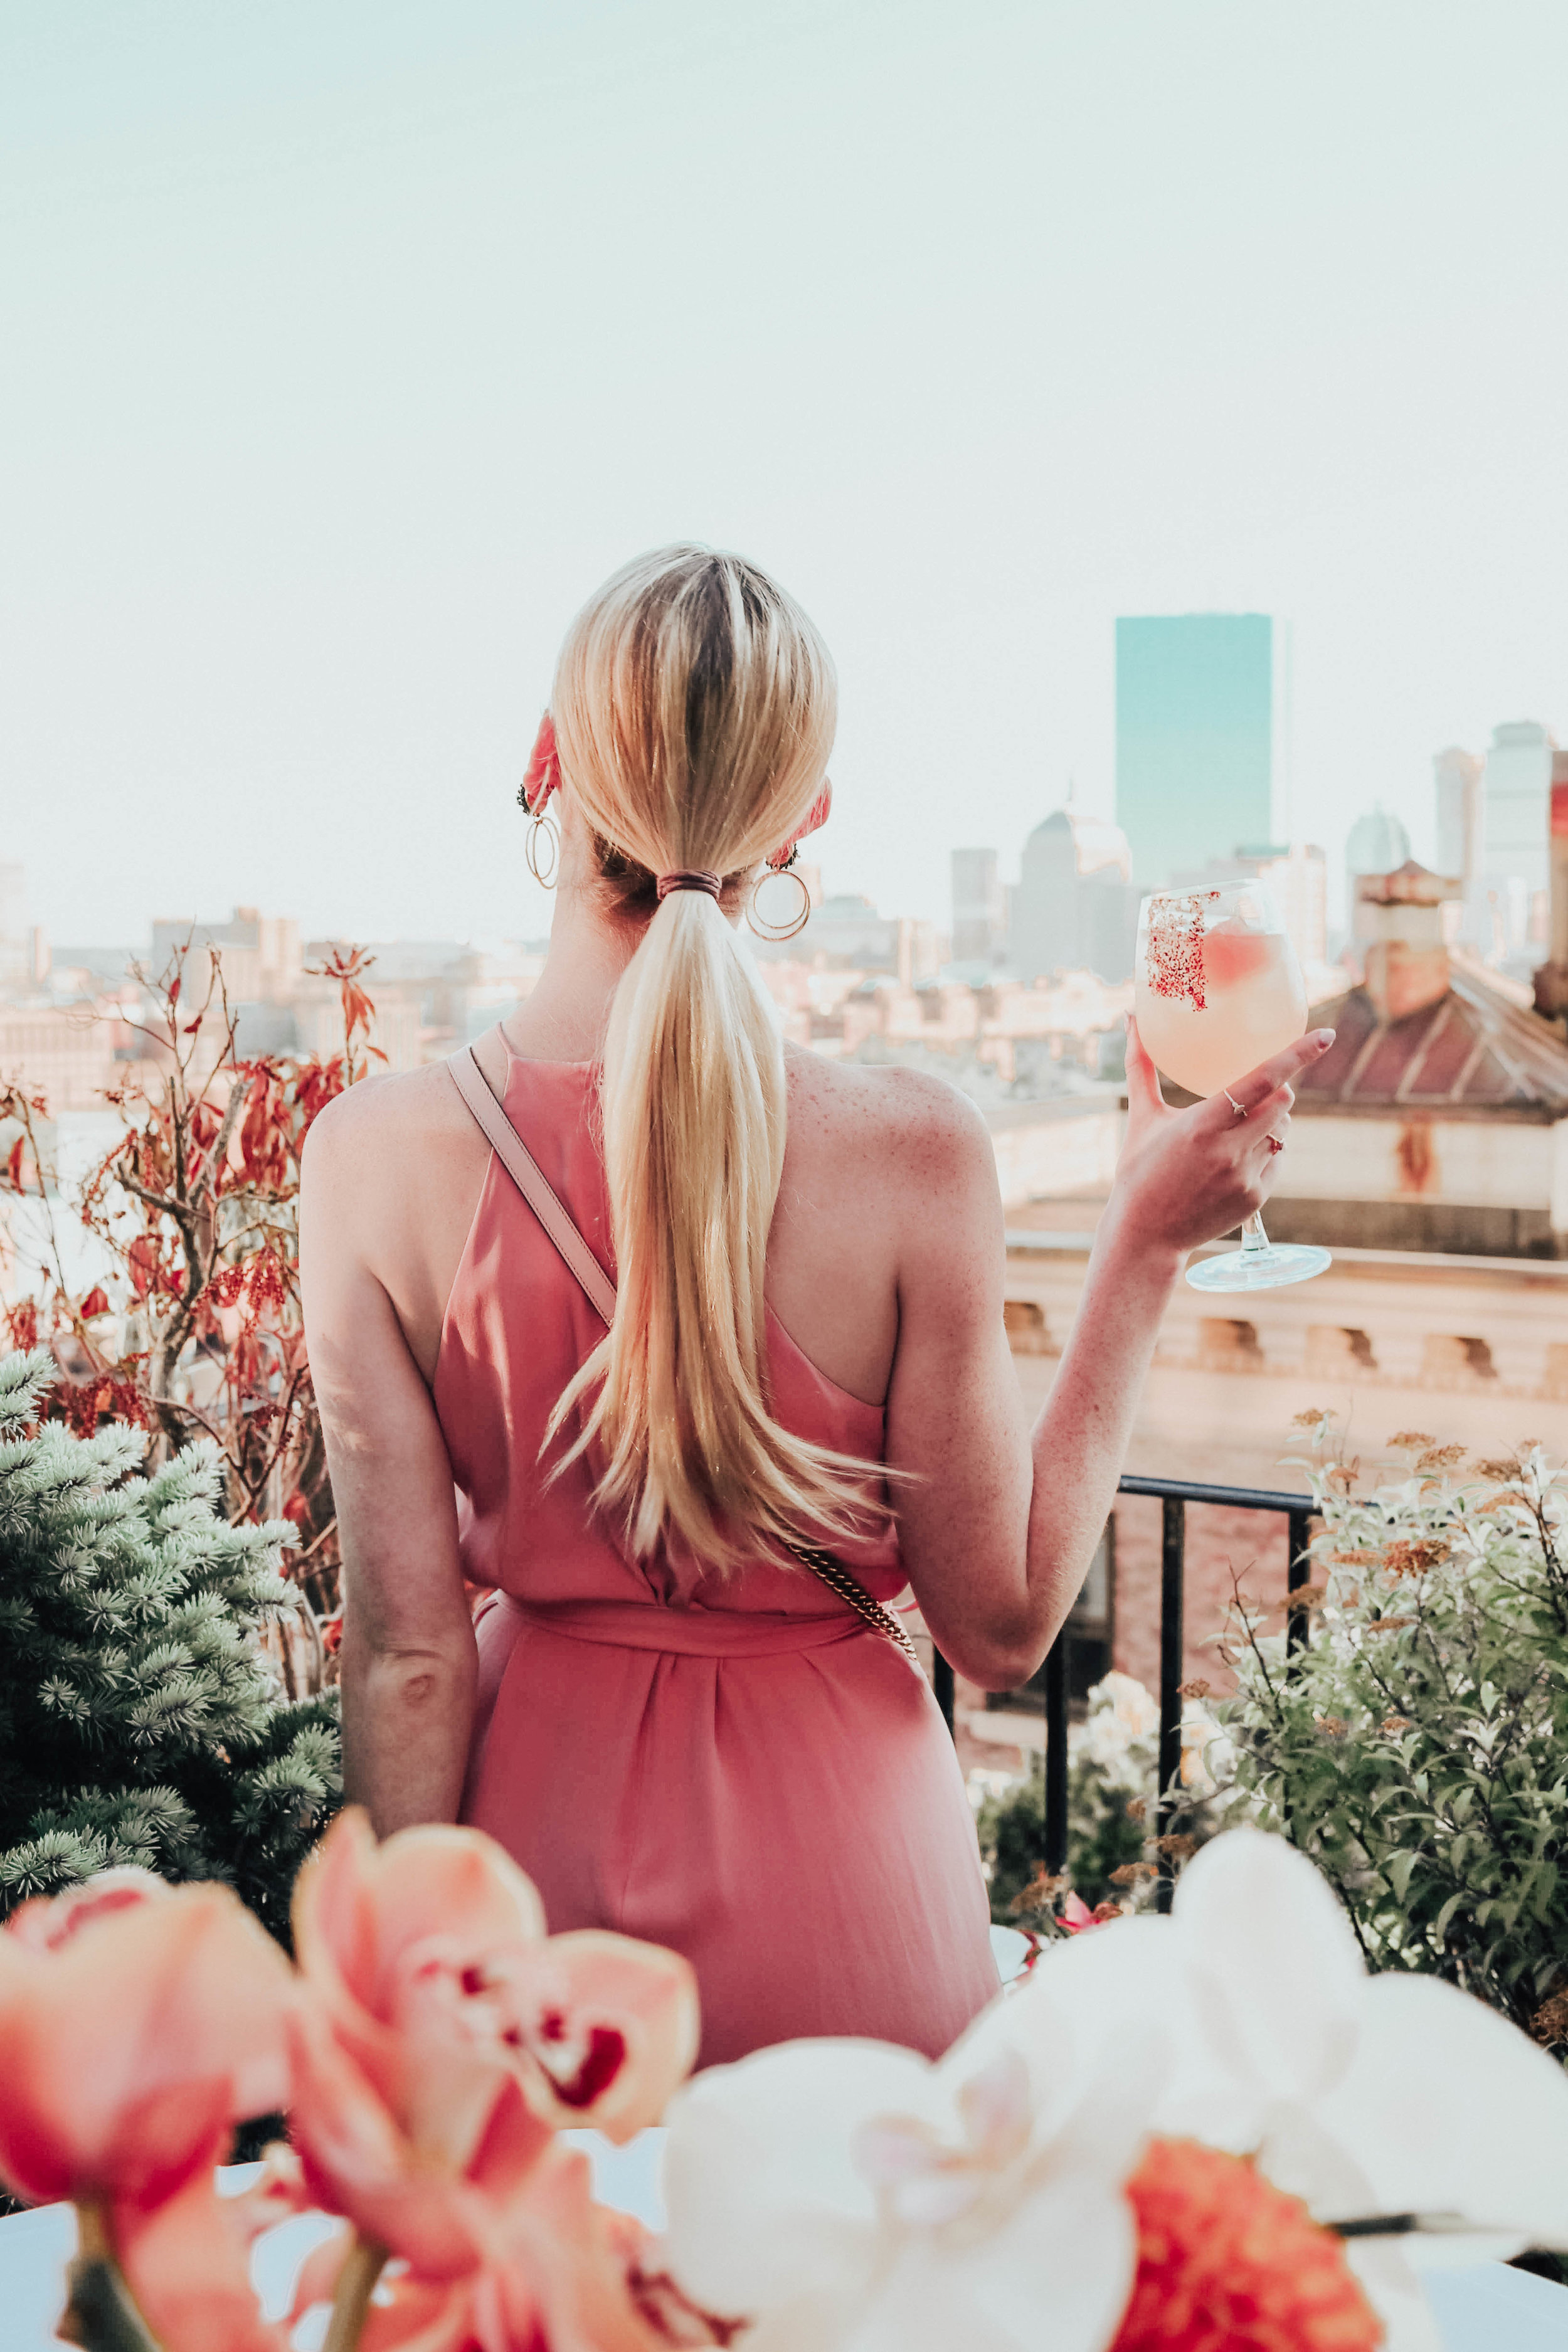 Boston Blogger | @maevestier